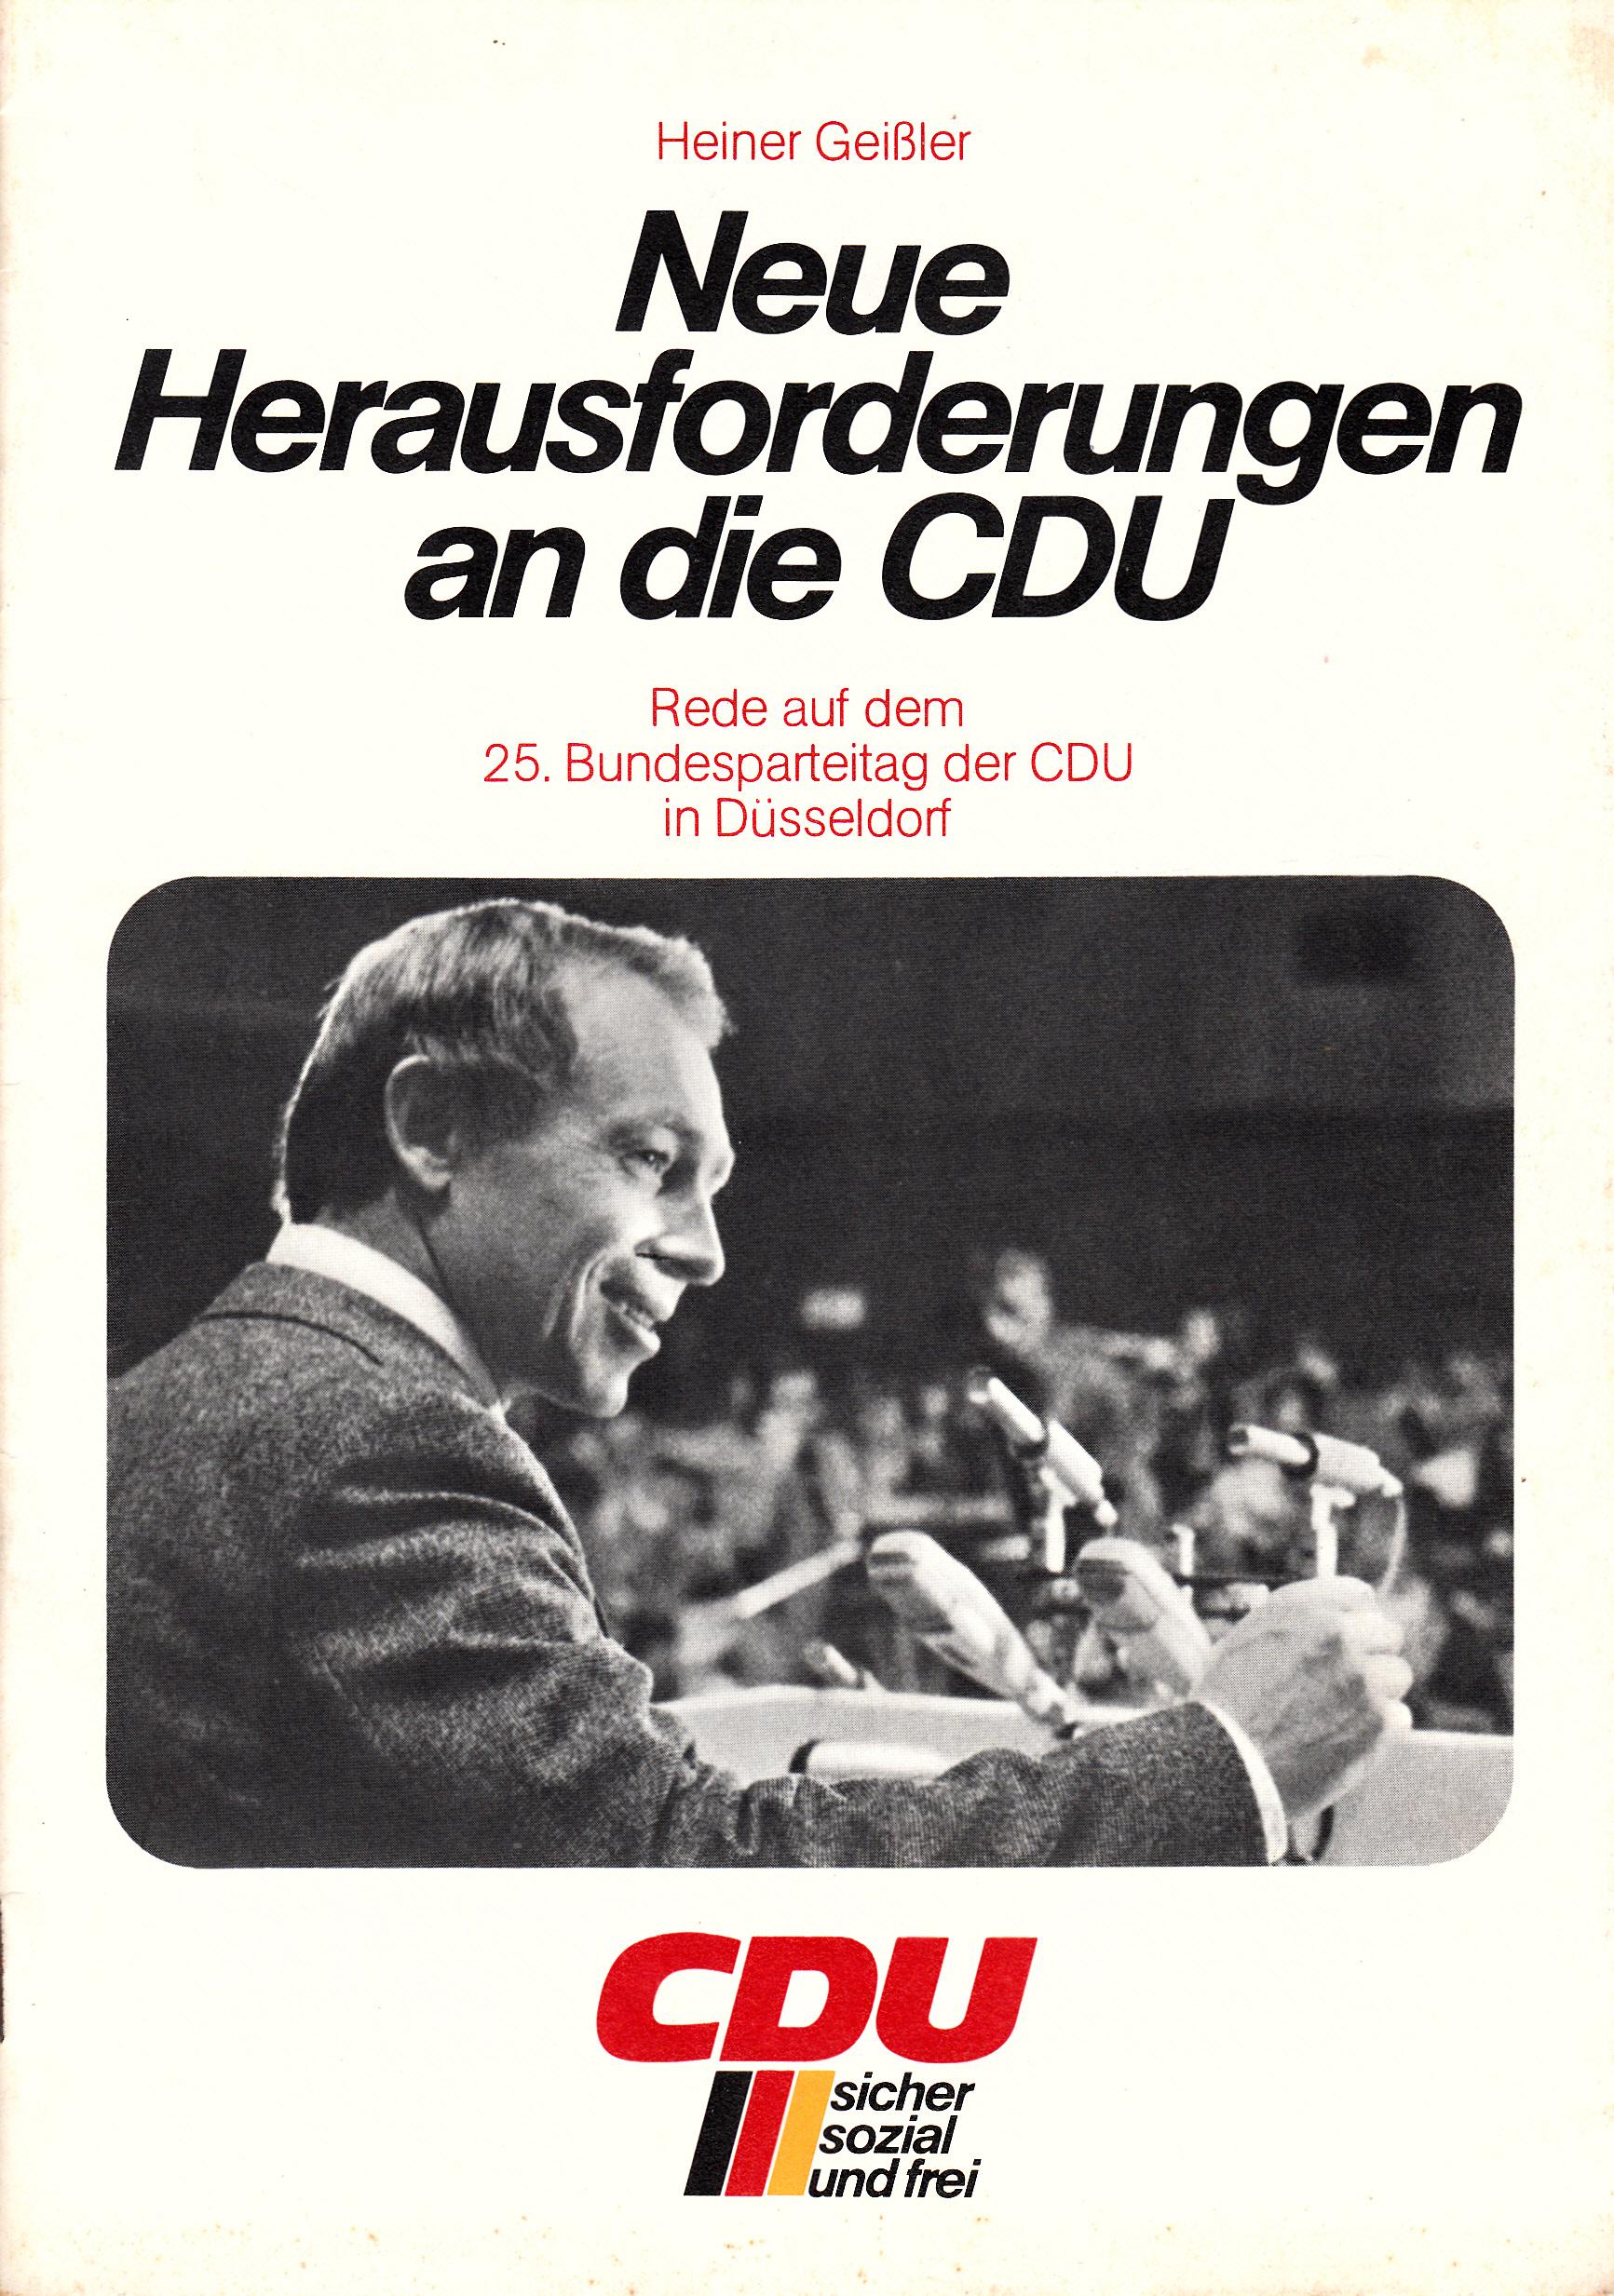 CDU_alemanha_0003